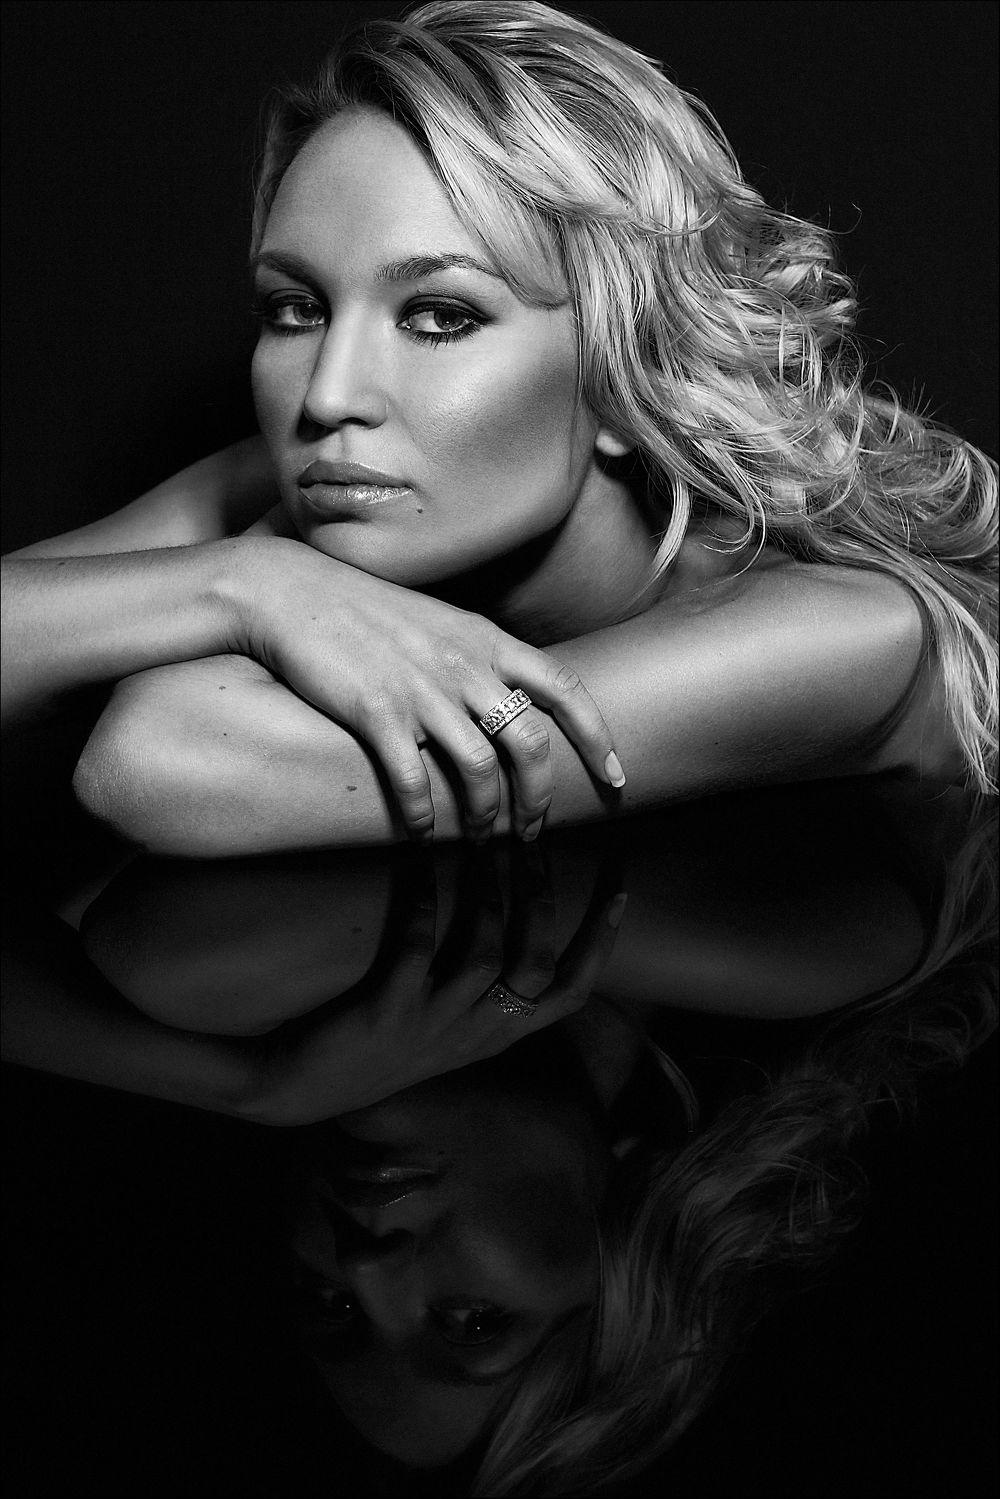 Bild mit Akt, beauty&portrait, Schönheit, Wellness, schwarz weiß, make up, beauty, Sexy, Model, SW, schminke, style, ästhetik, fotoshooting